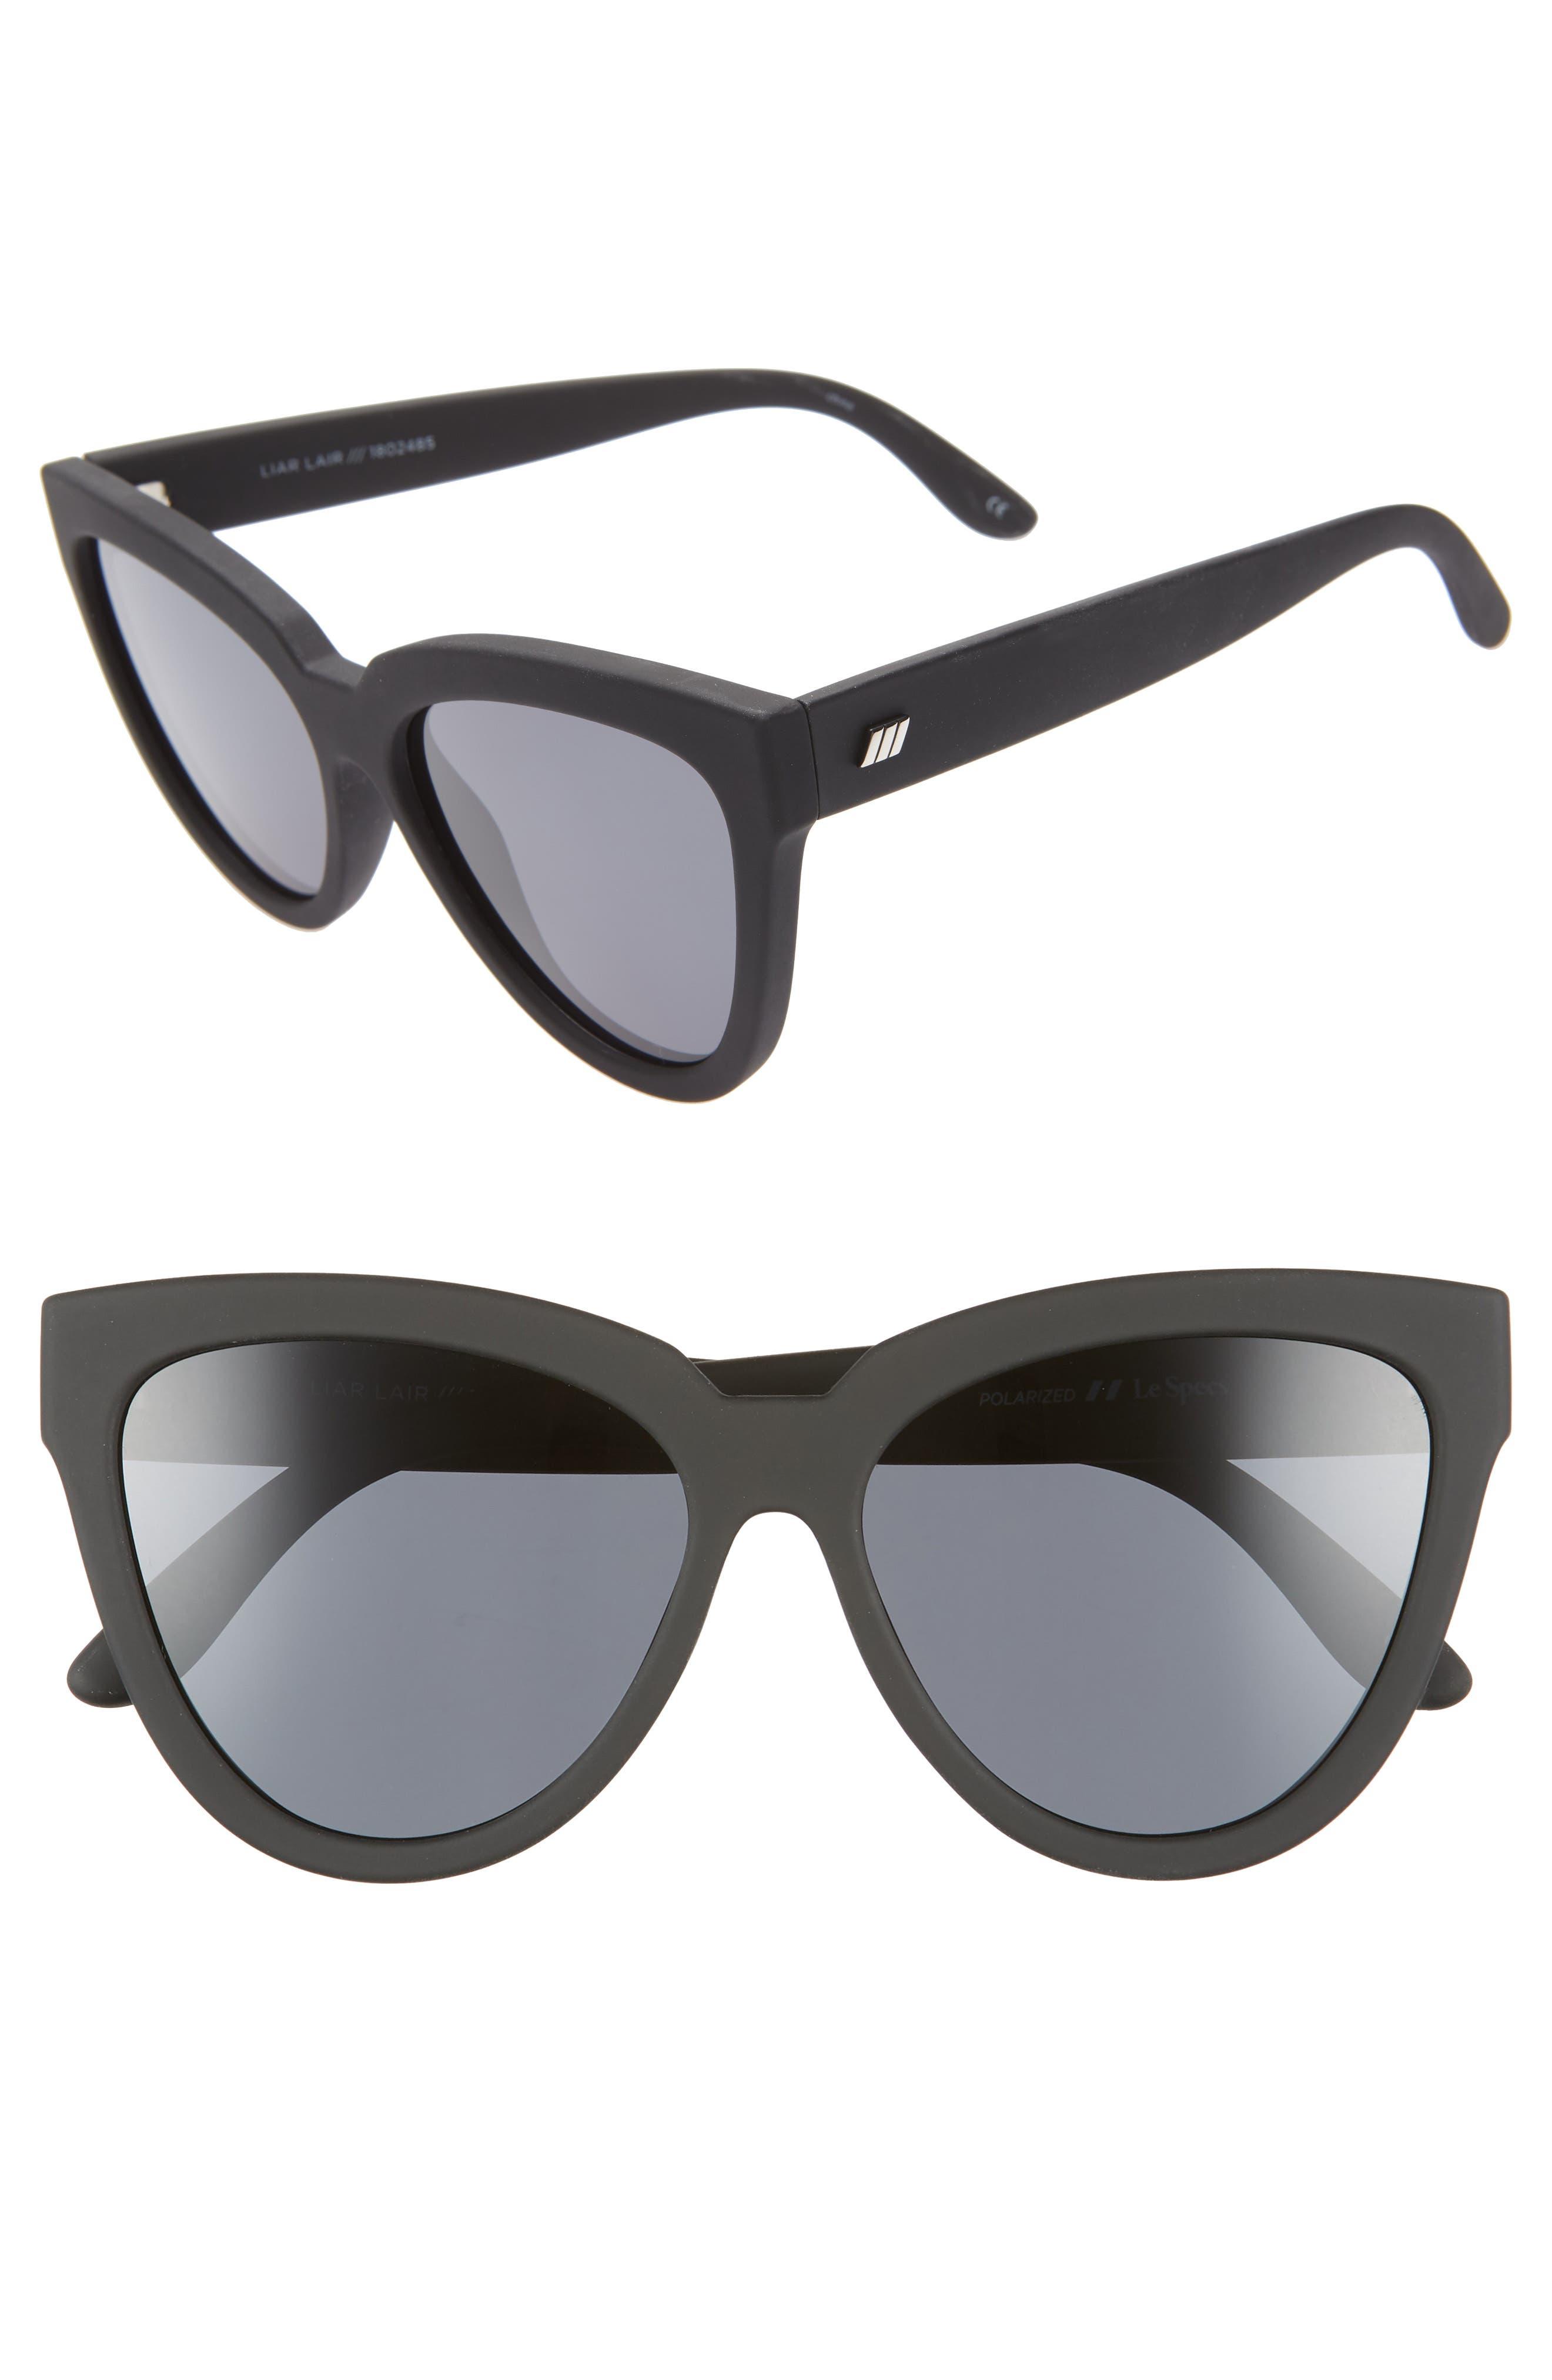 Le Specs Liar Liar 57Mm Polarized Cat Eye Sunglasses - Black Rubber